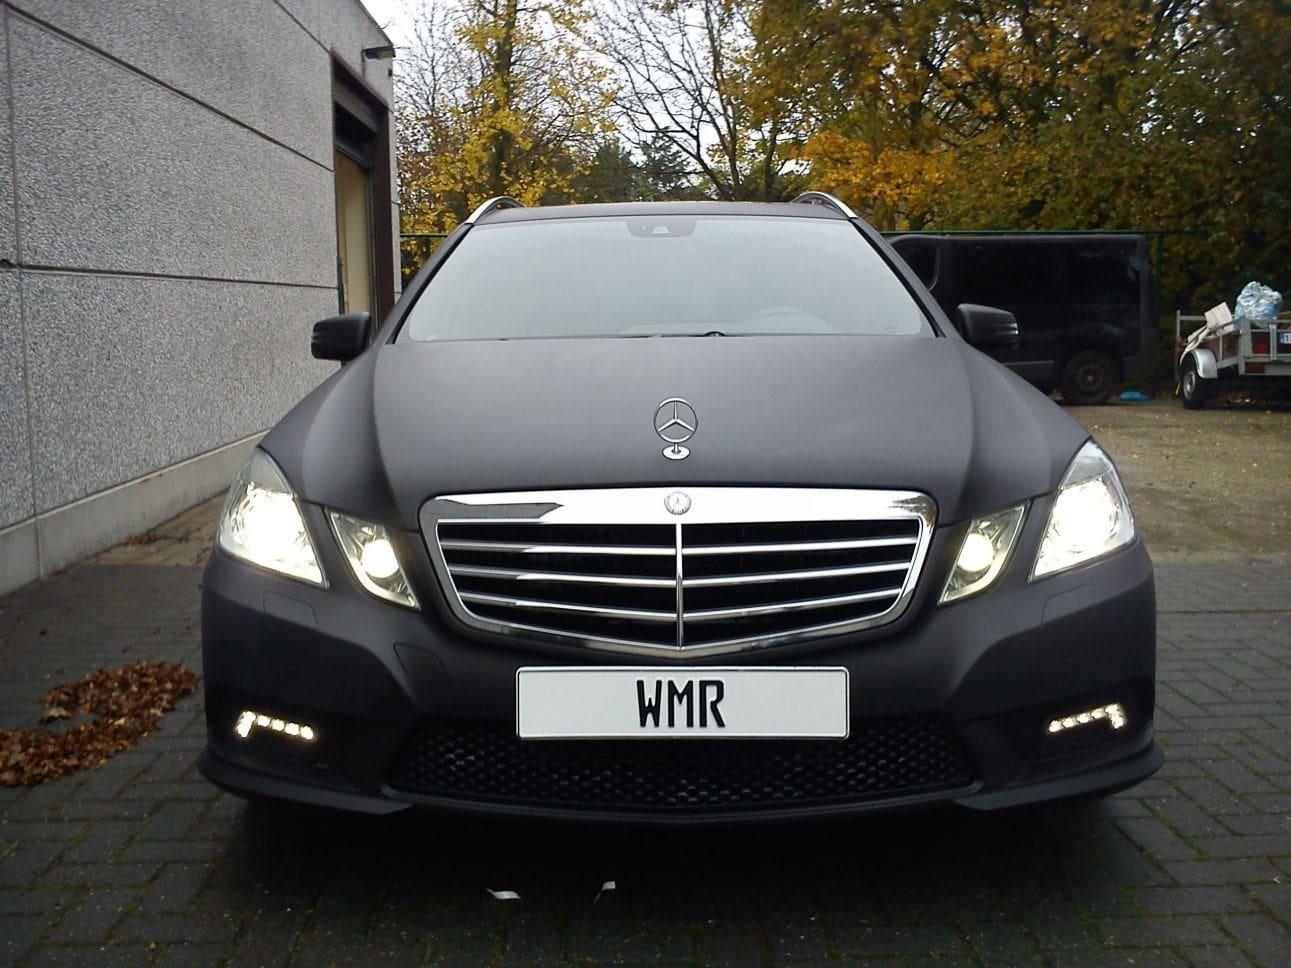 Mercedes E320 met Mat Zwarte Wrap, Carwrapping door Wrapmyride.nu Foto-nr:6226, ©2021